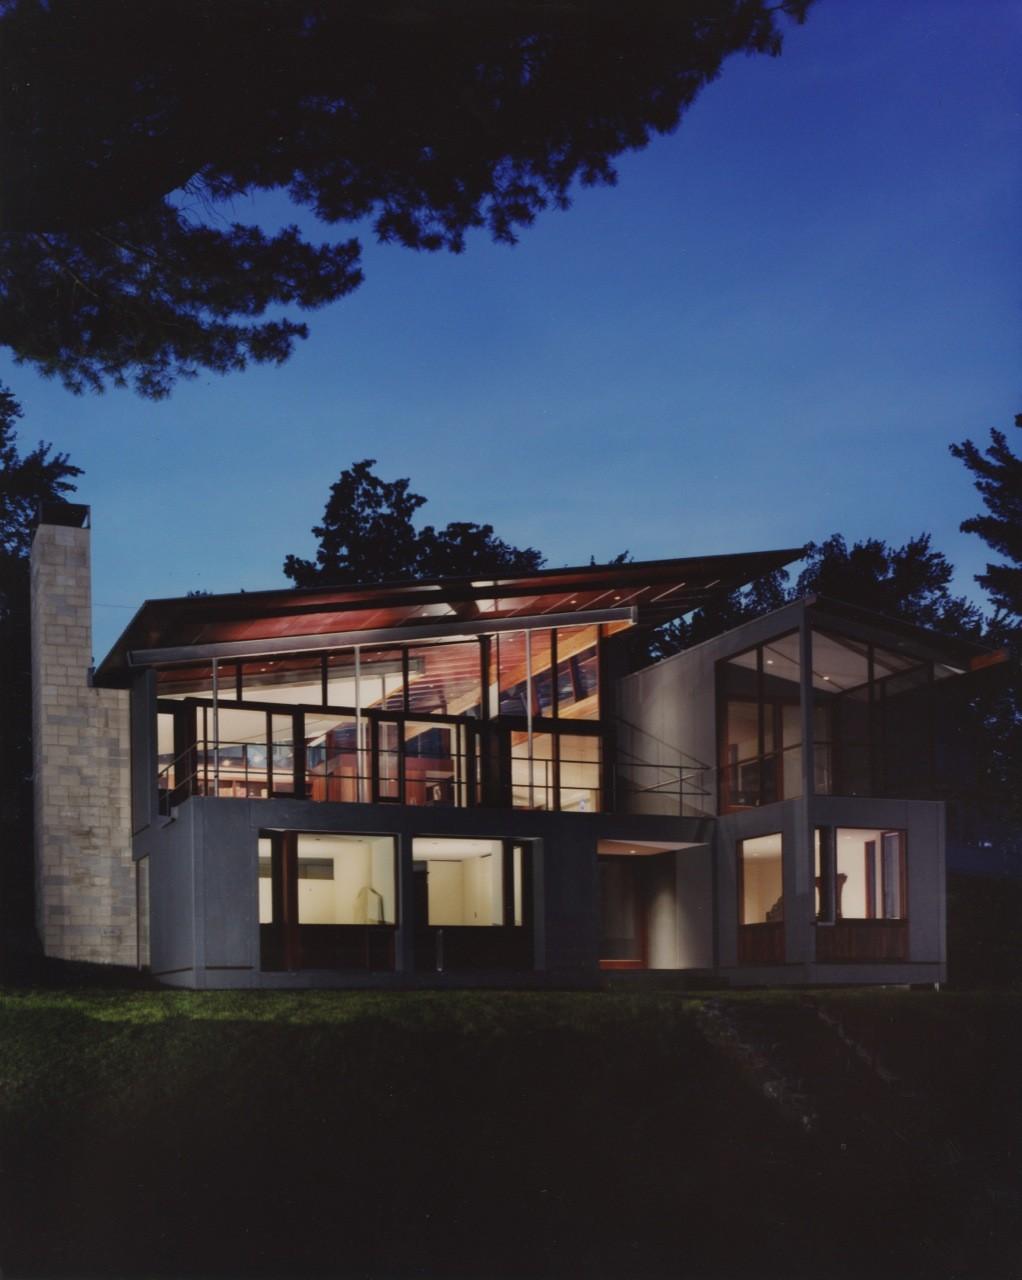 Lake House / Joseph N. Biondo, Courtesy of  joseph n. biondo